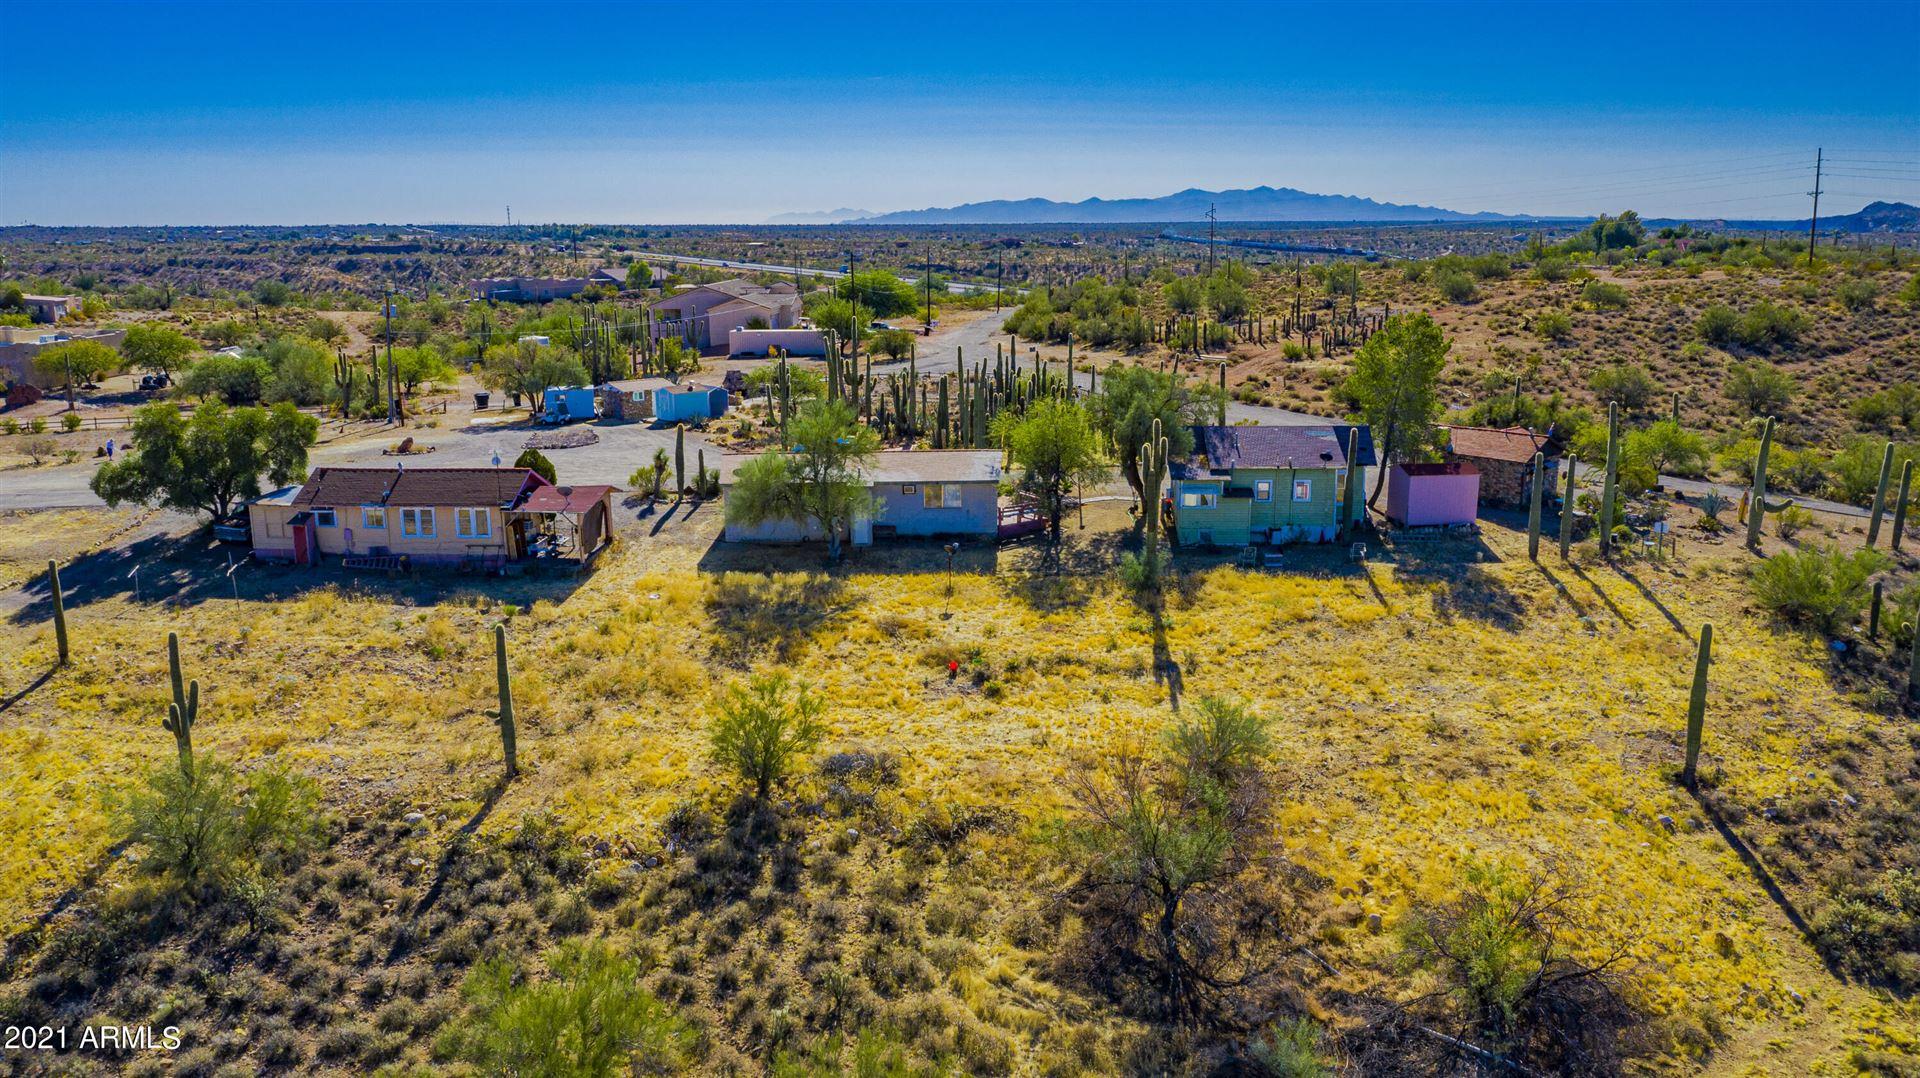 Photo of 44004 W GRAND Avenue, Morristown, AZ 85342 (MLS # 6200791)